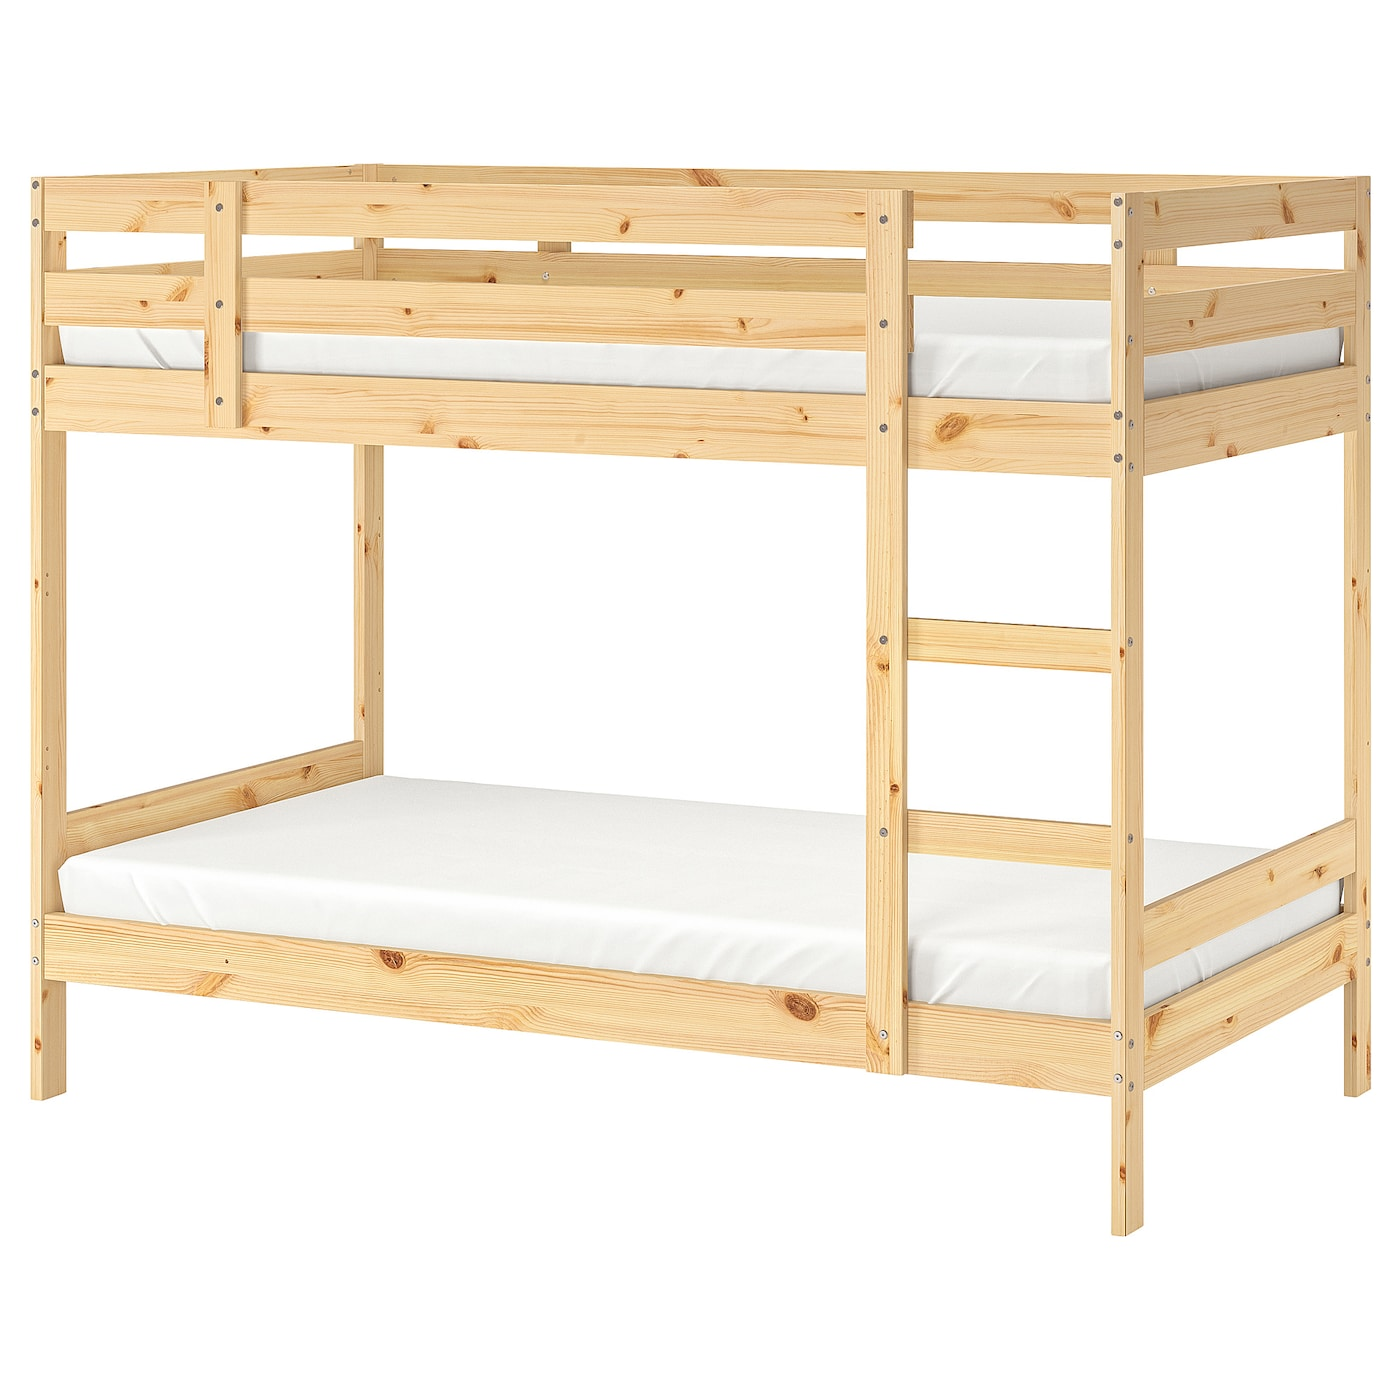 Stapelbed Met Dubbel Bed.Hoogslaper Stapelbed Ikea